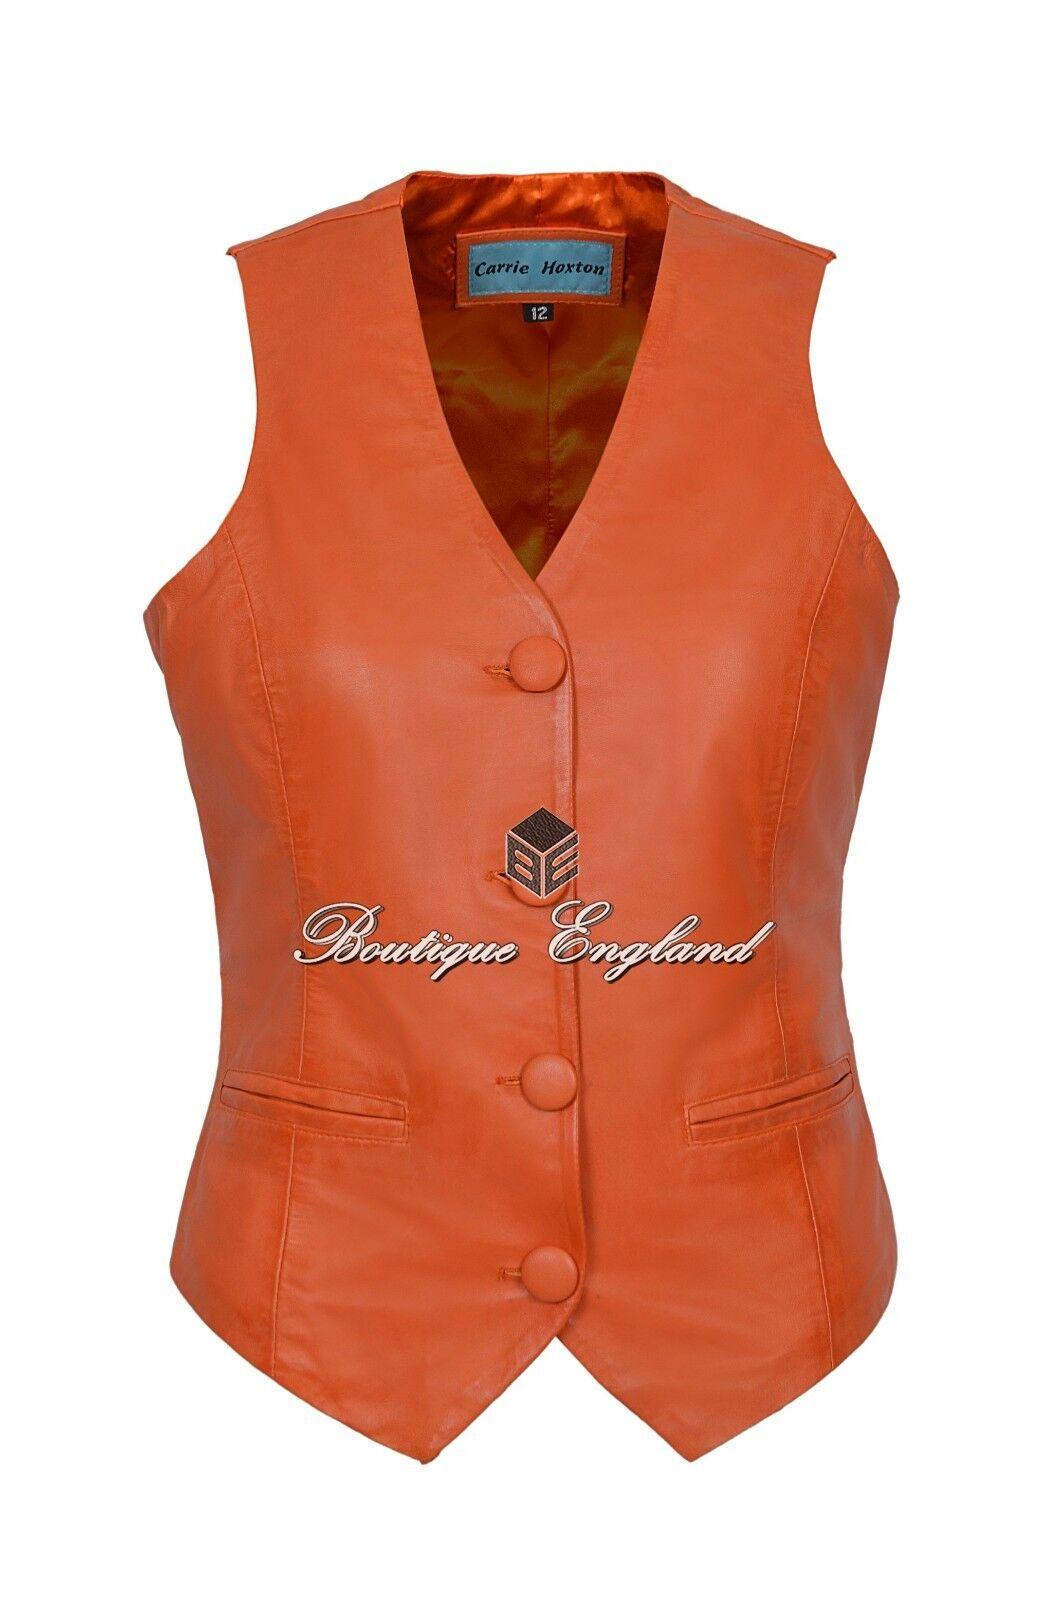 Ladies orange Waistcoat Cool Casual Fashion Vest Soft Lambskin Leather 5701